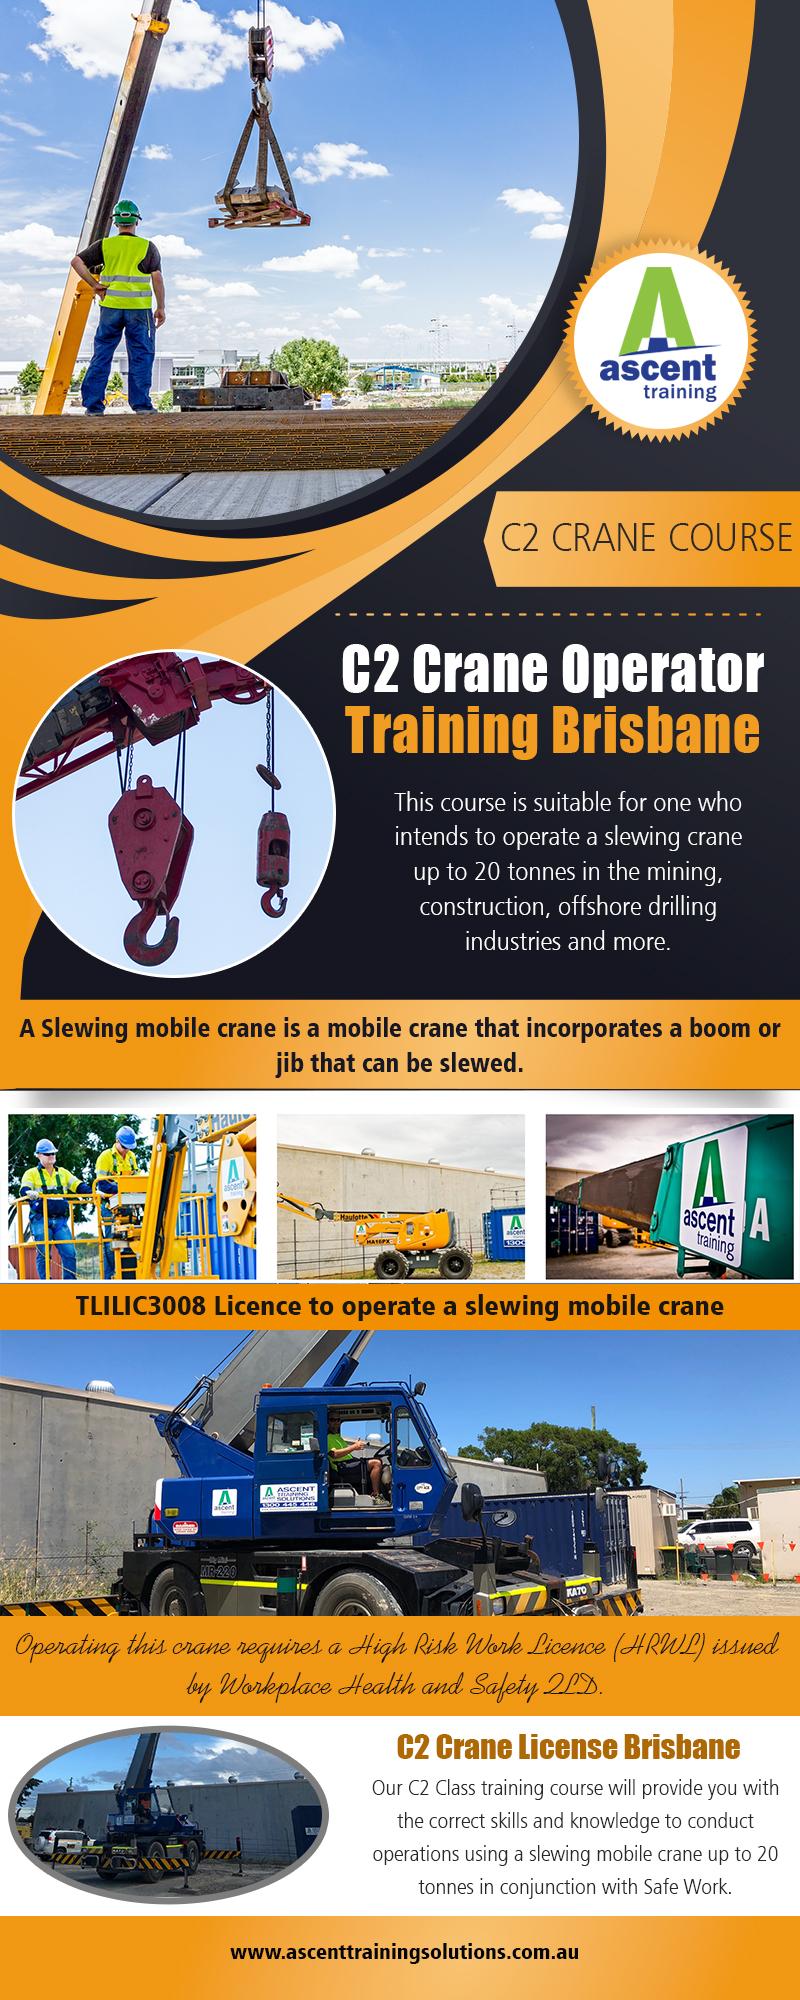 C2 Crane Operator Training Brisbane